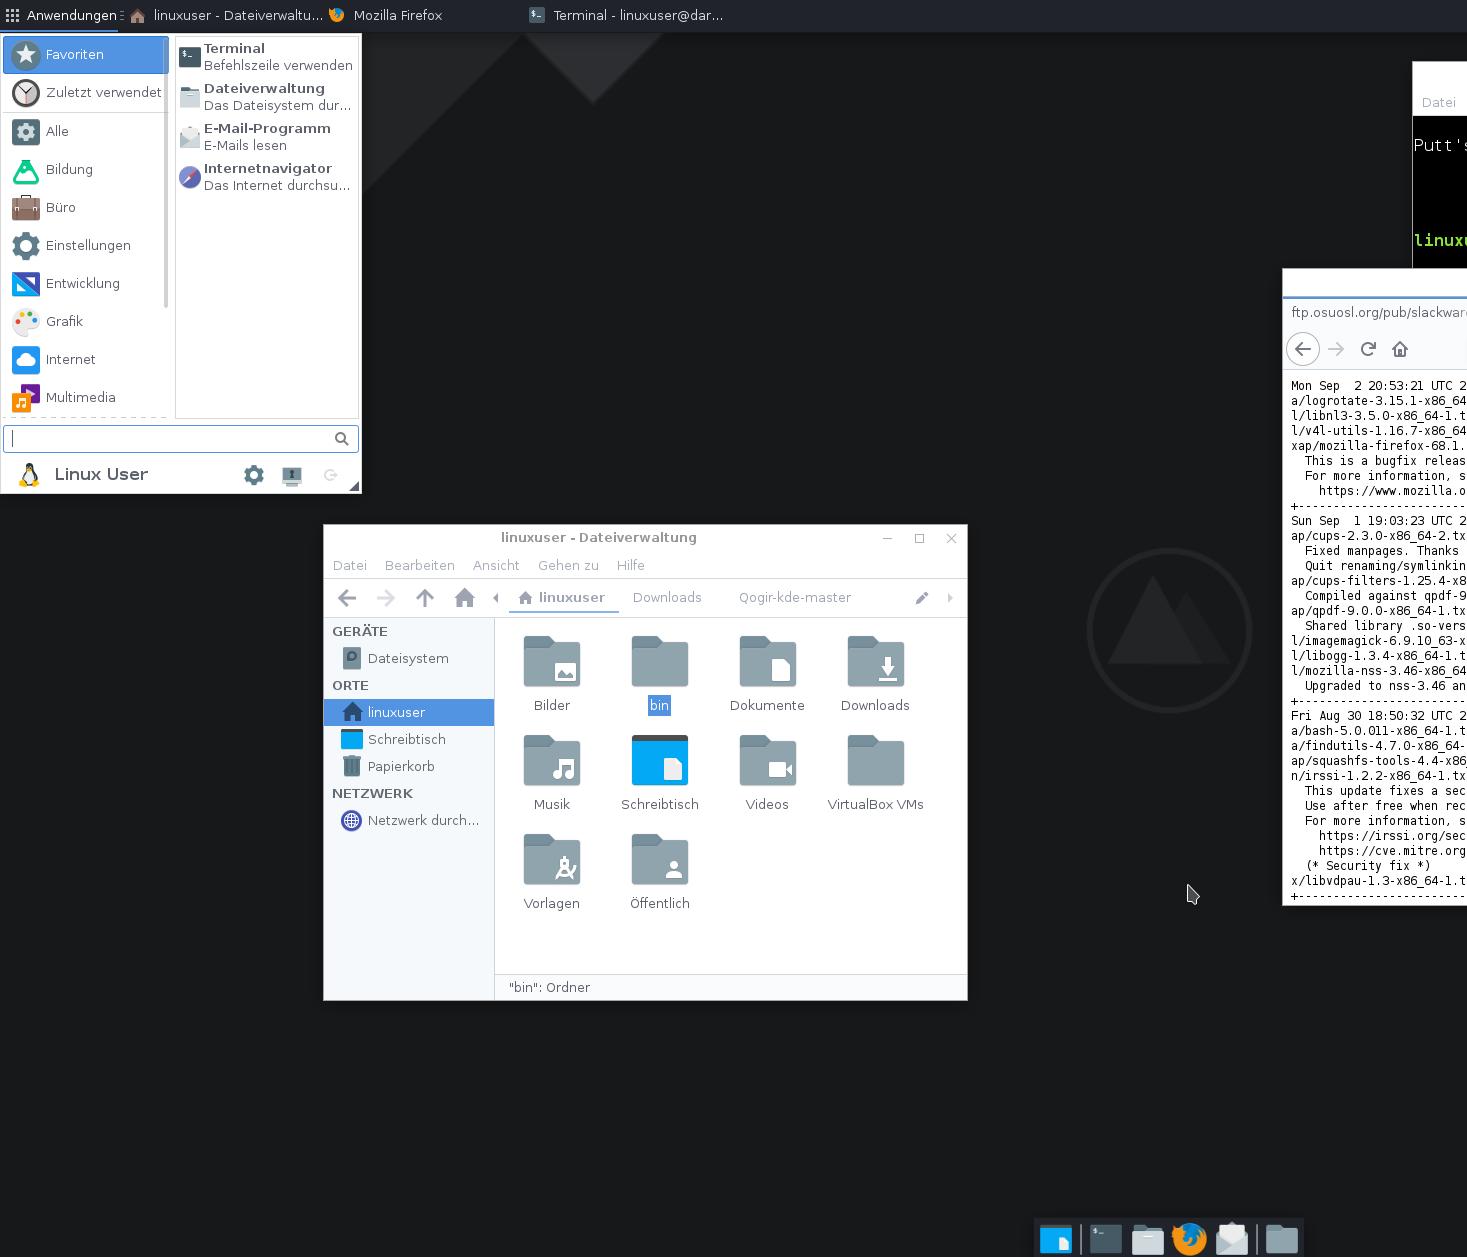 Top Desktop Environments For Ubuntu 20.04 LTS